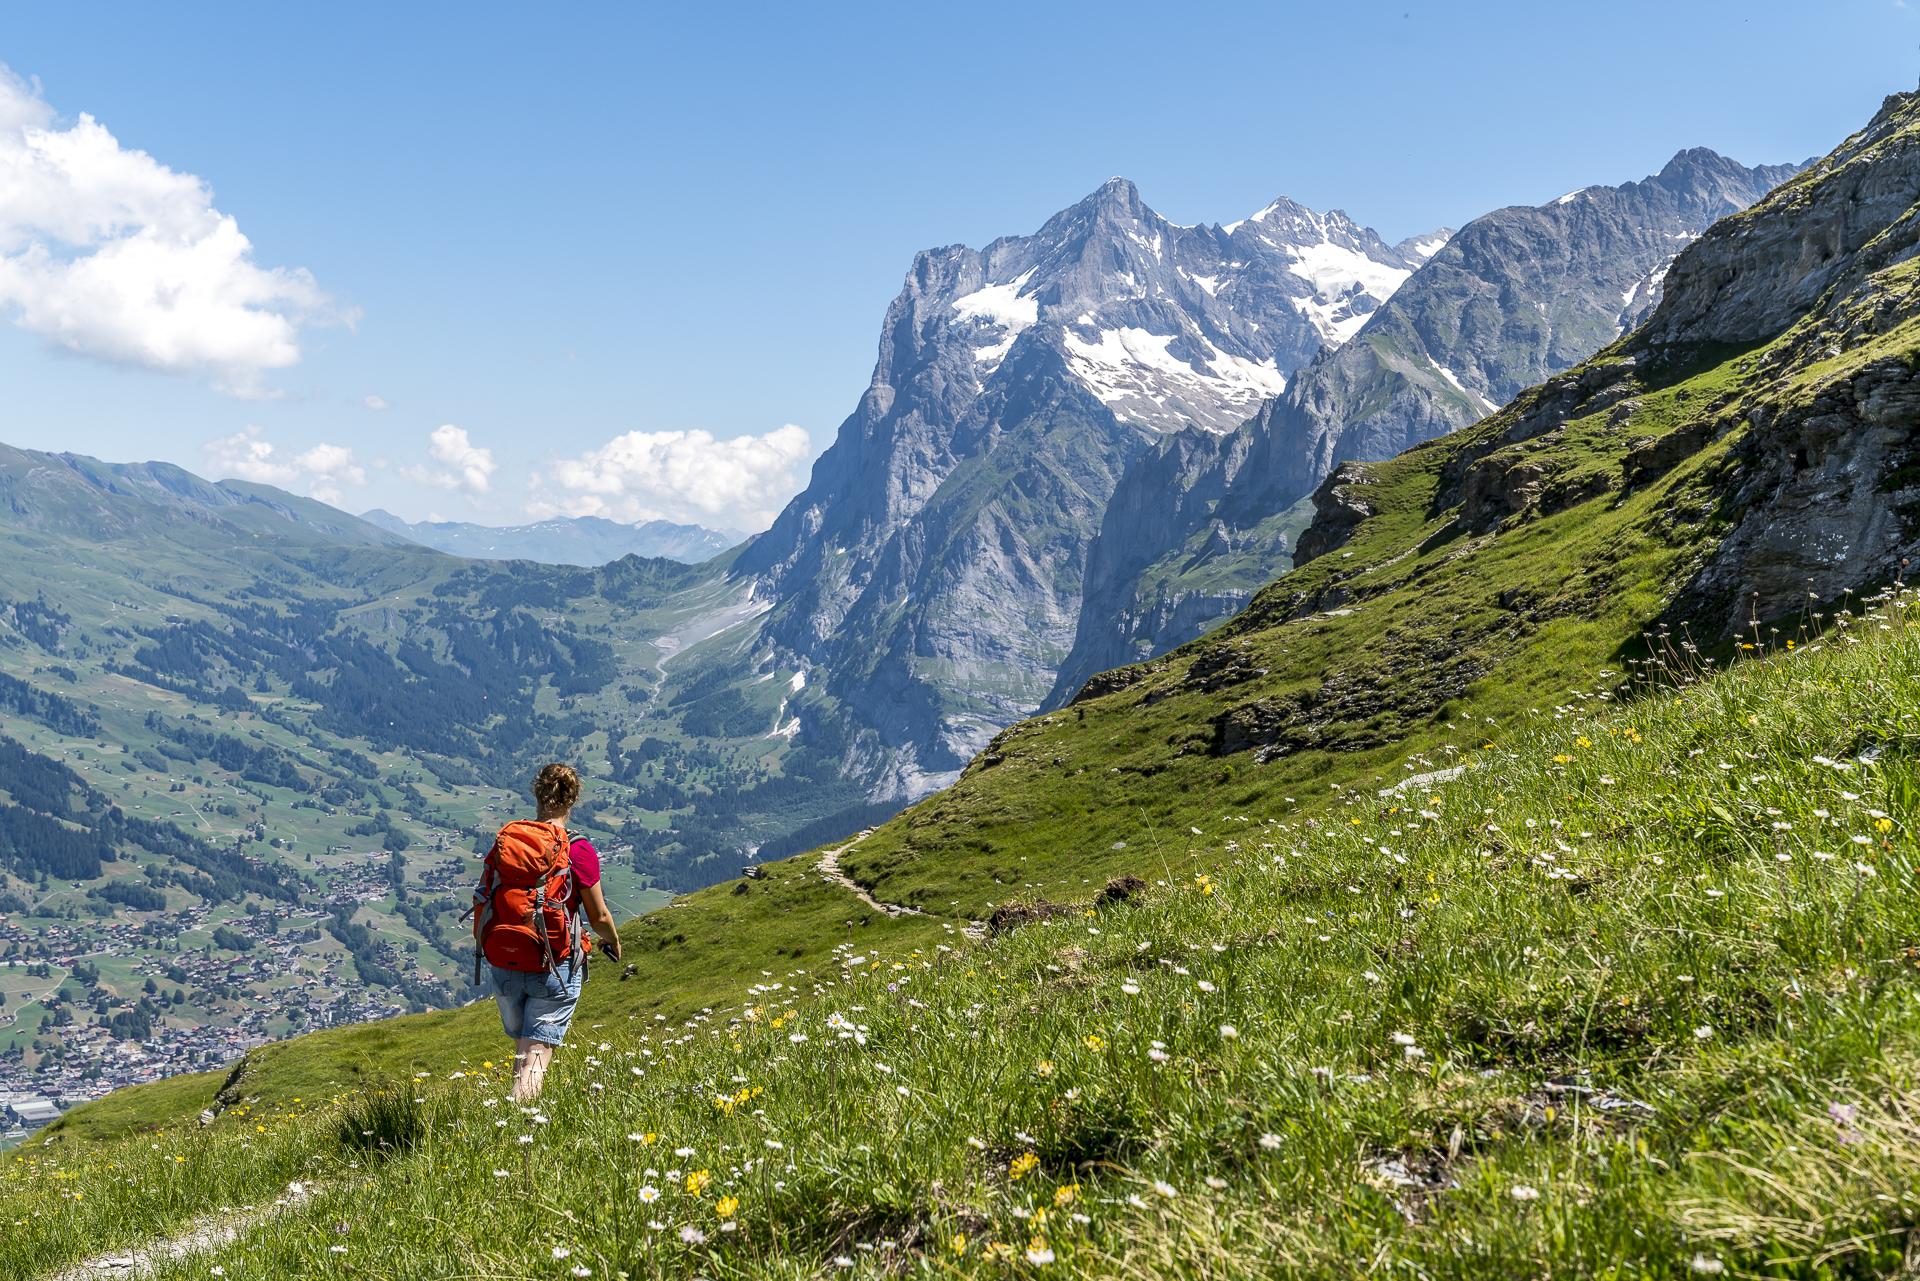 Wandern auf dem Eiger Trail